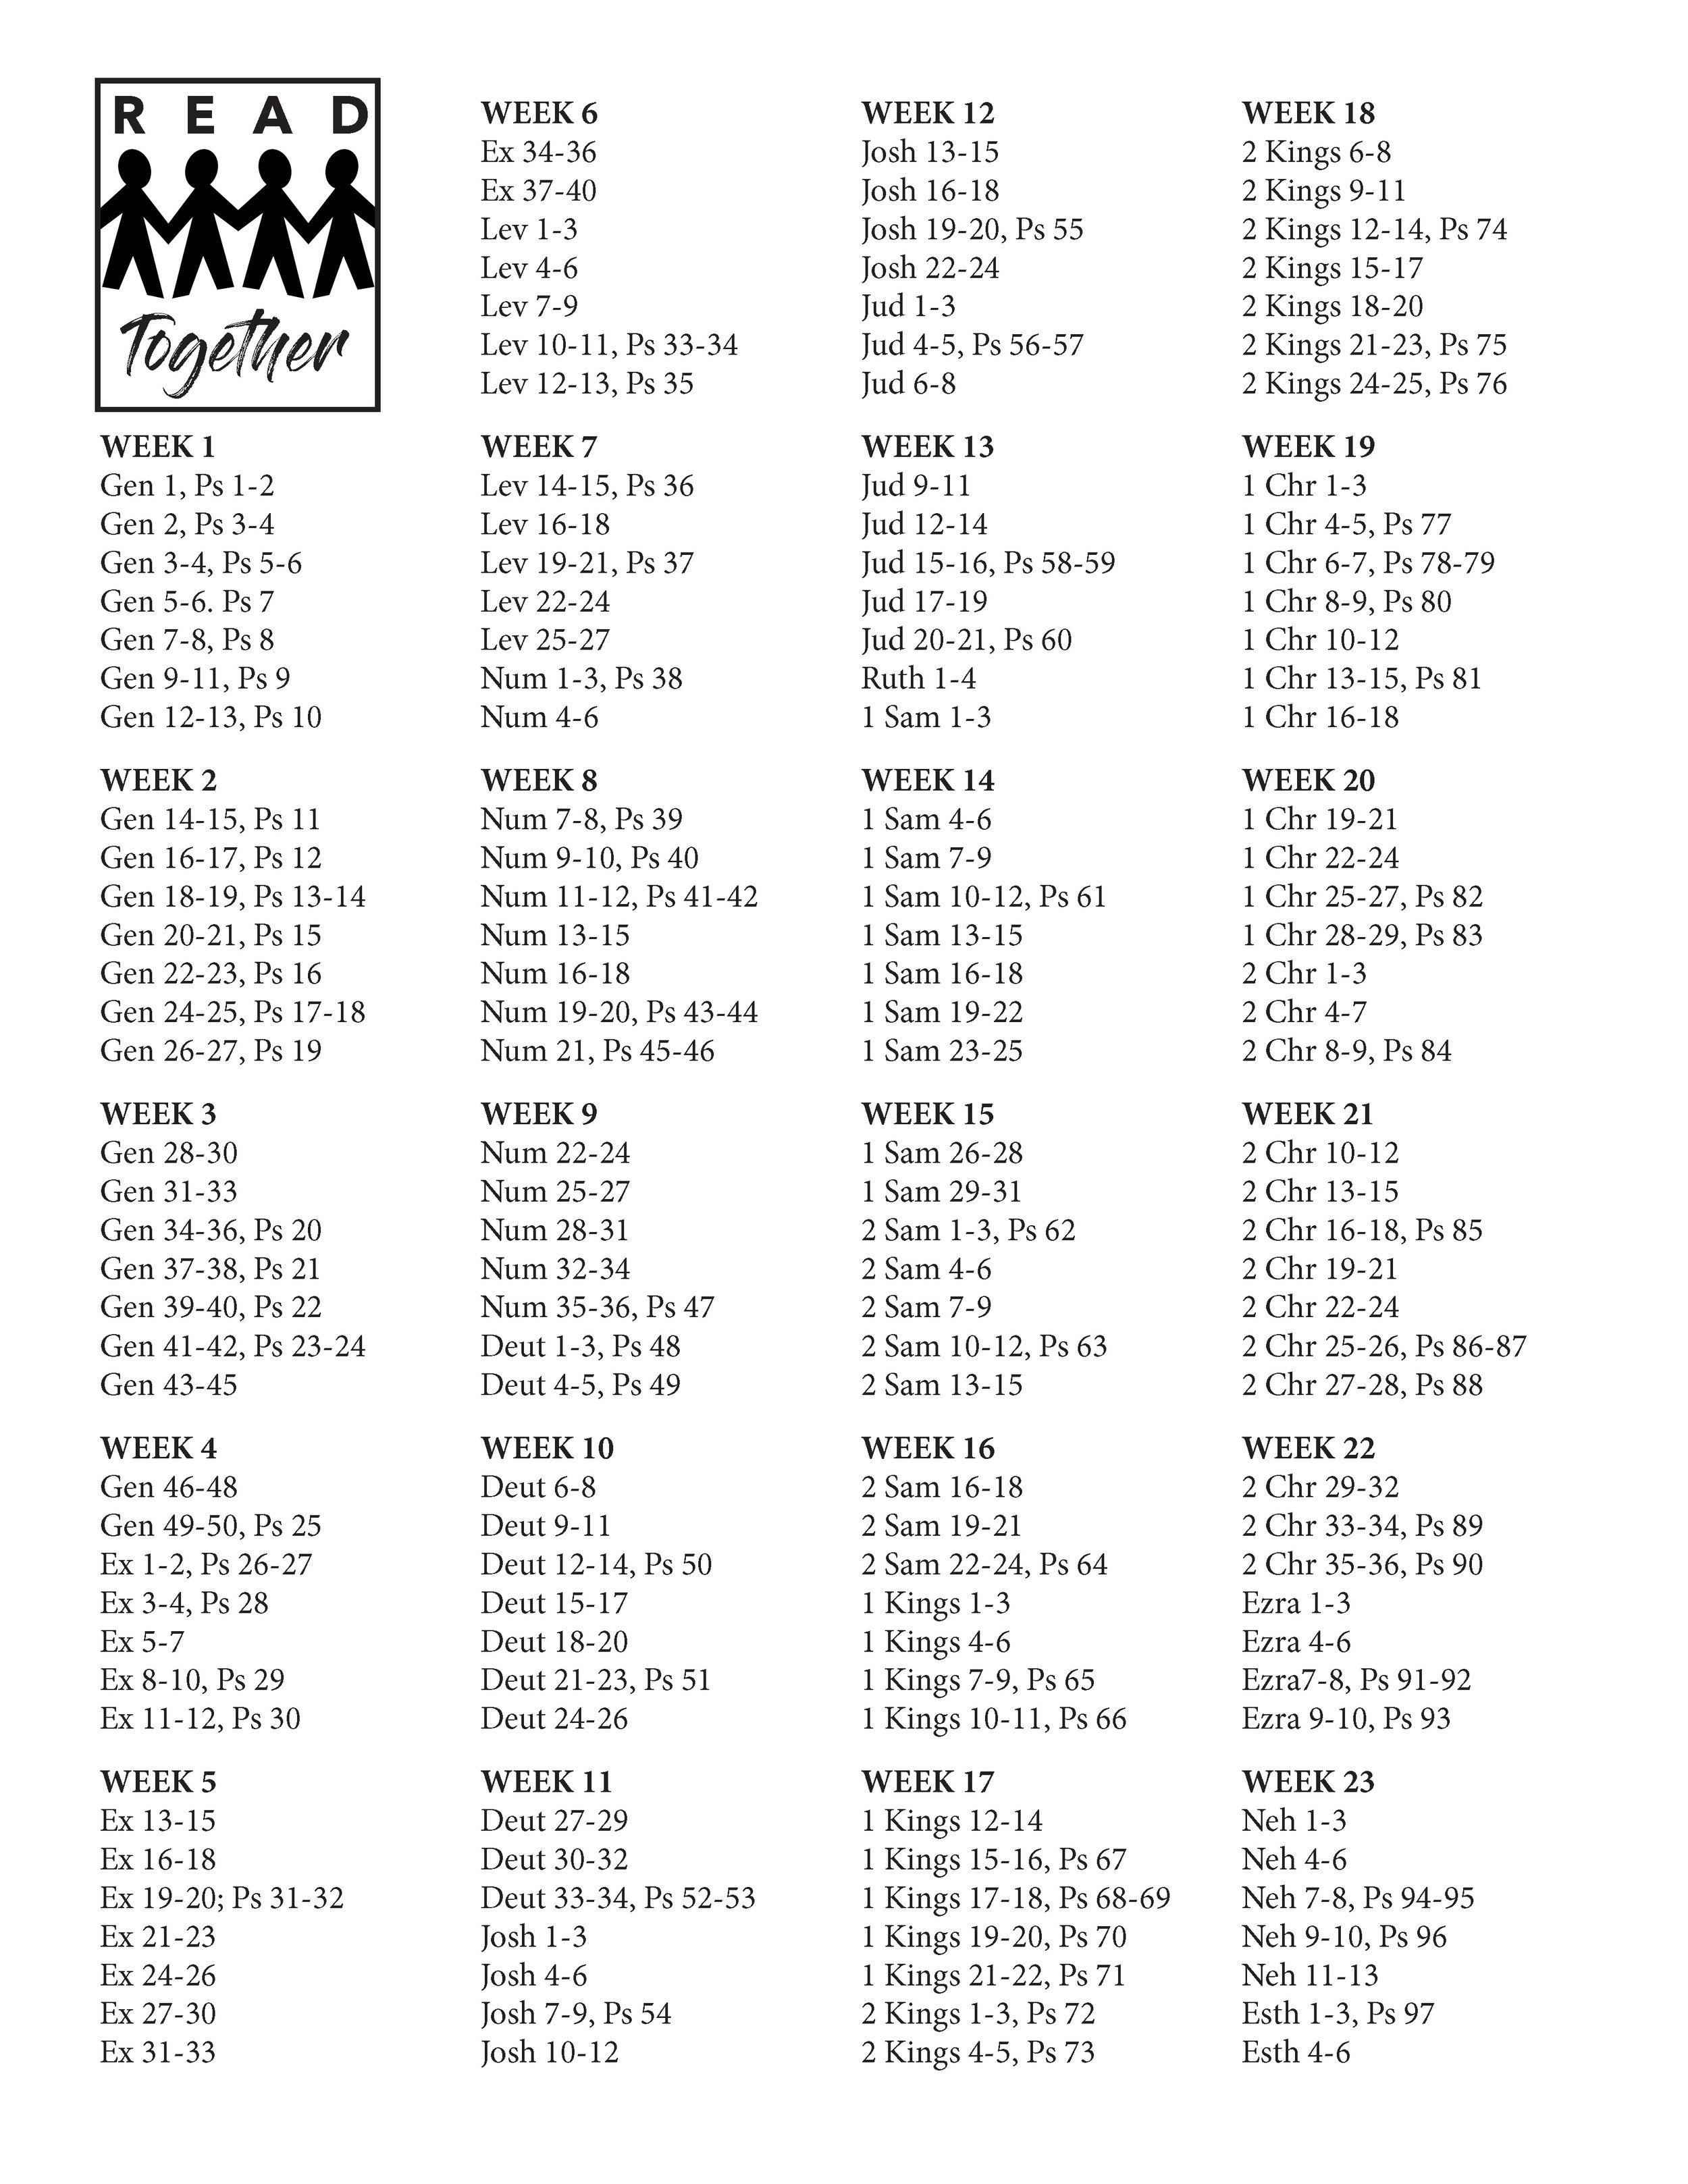 read+schedule_Page_1.jpg